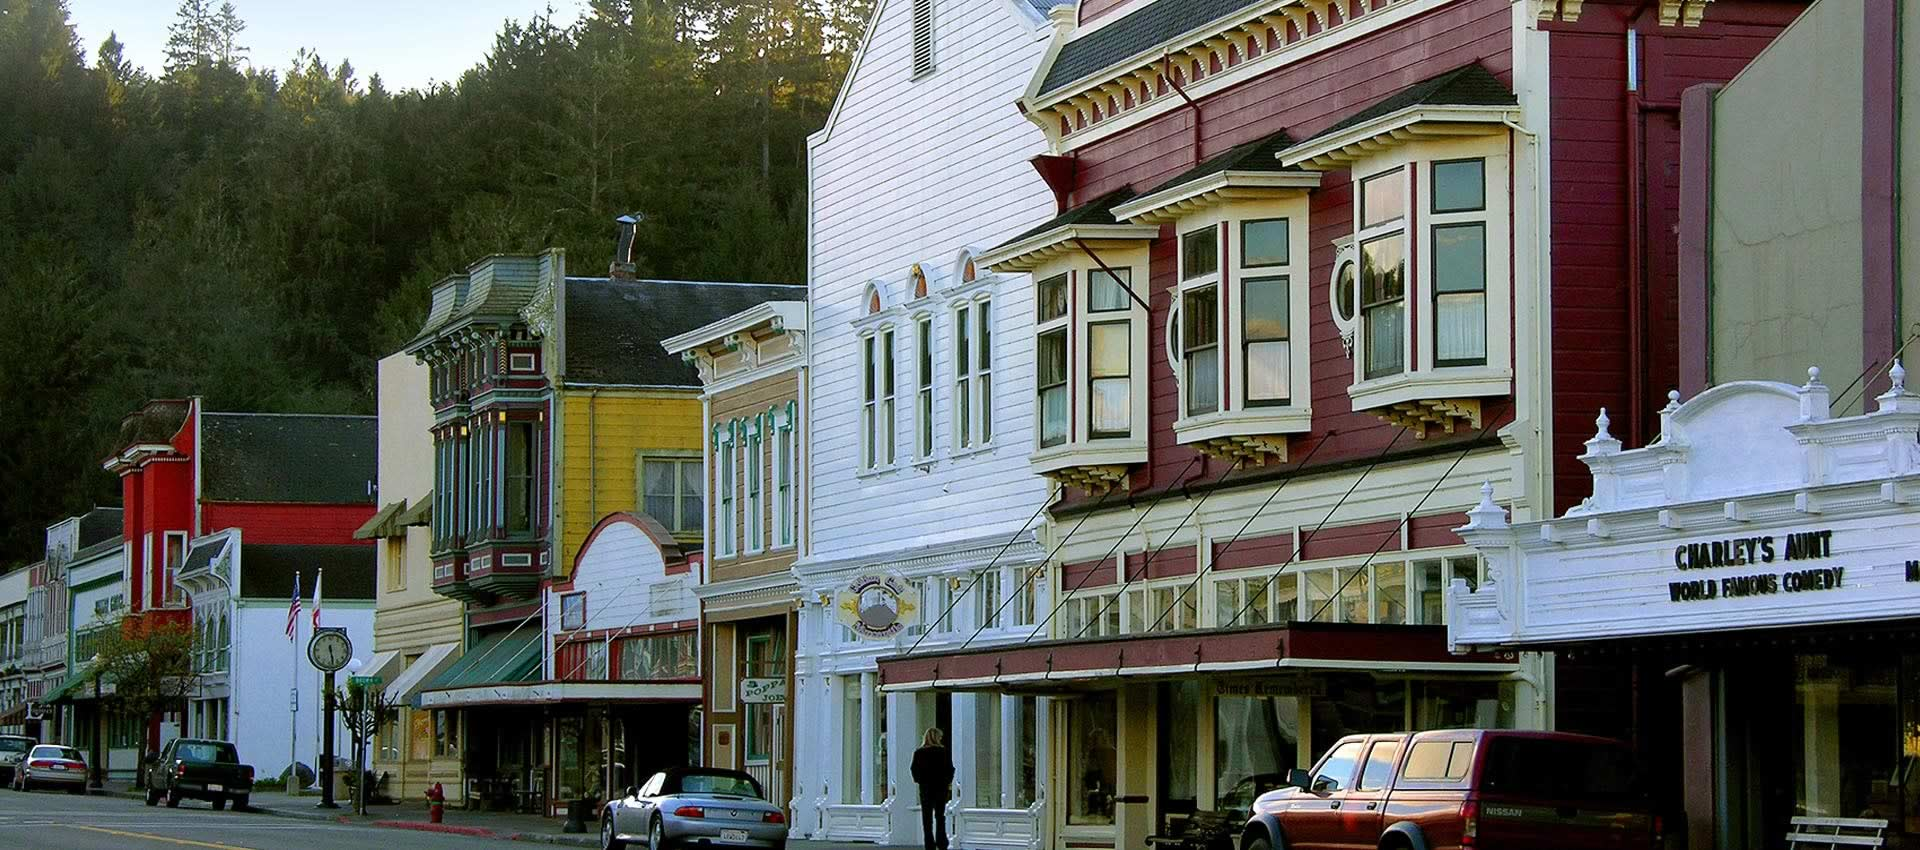 redwood-suites-town